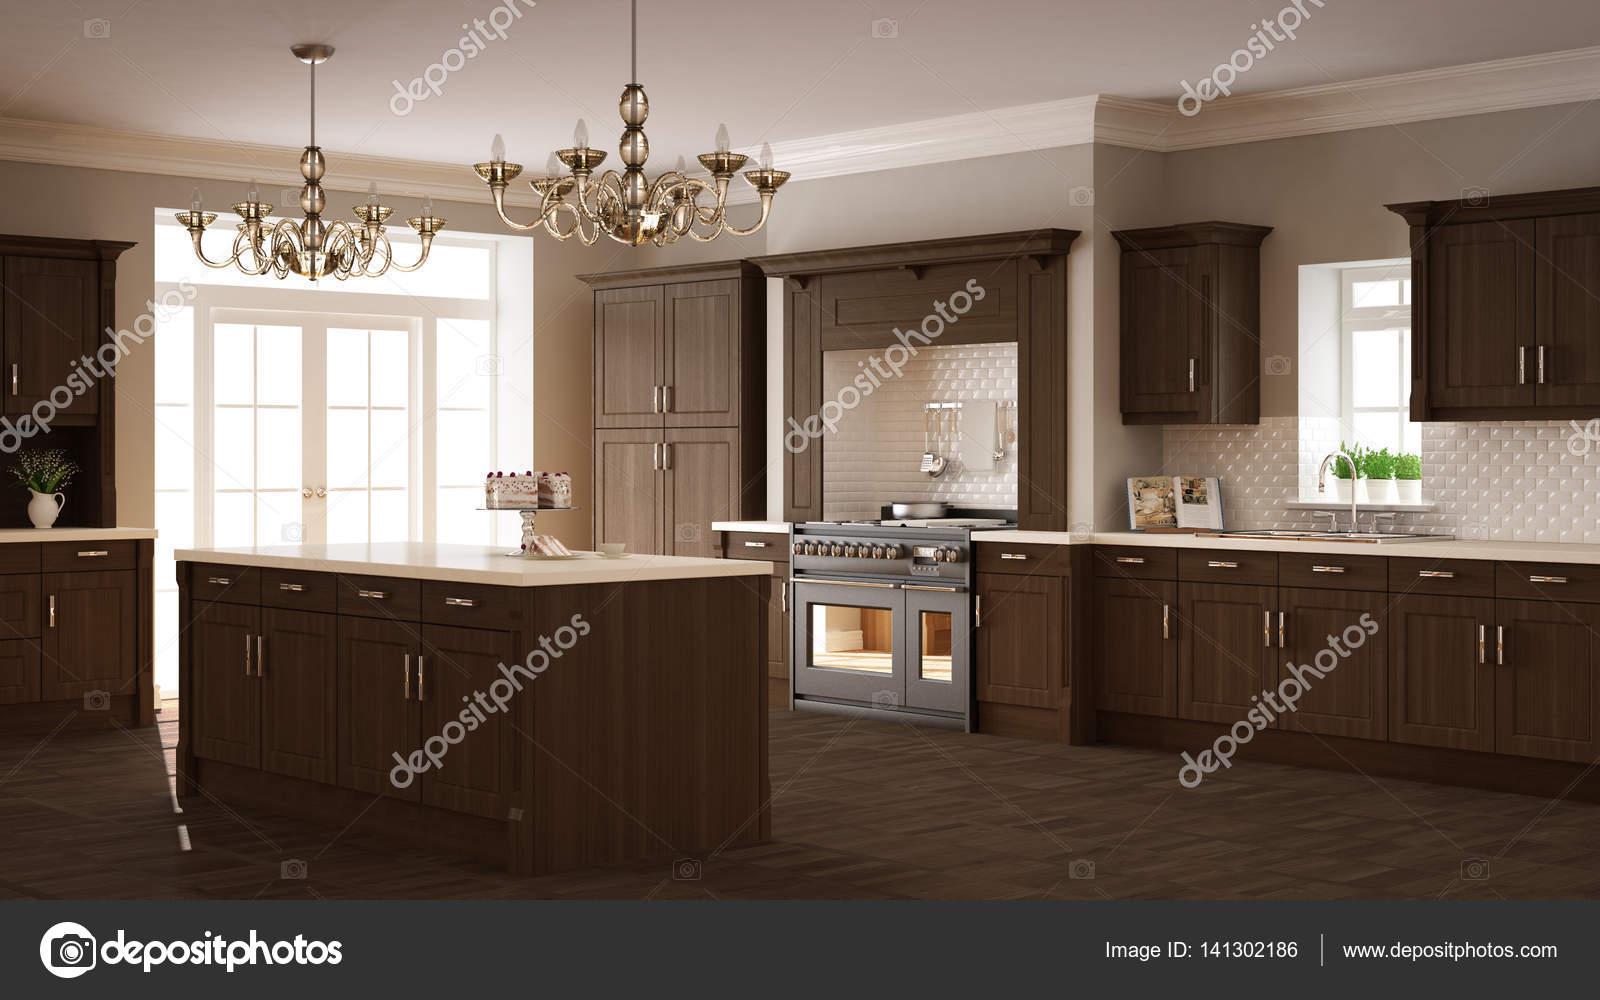 Classic Kitchen Elegant Interior Design With Wooden Details Stock